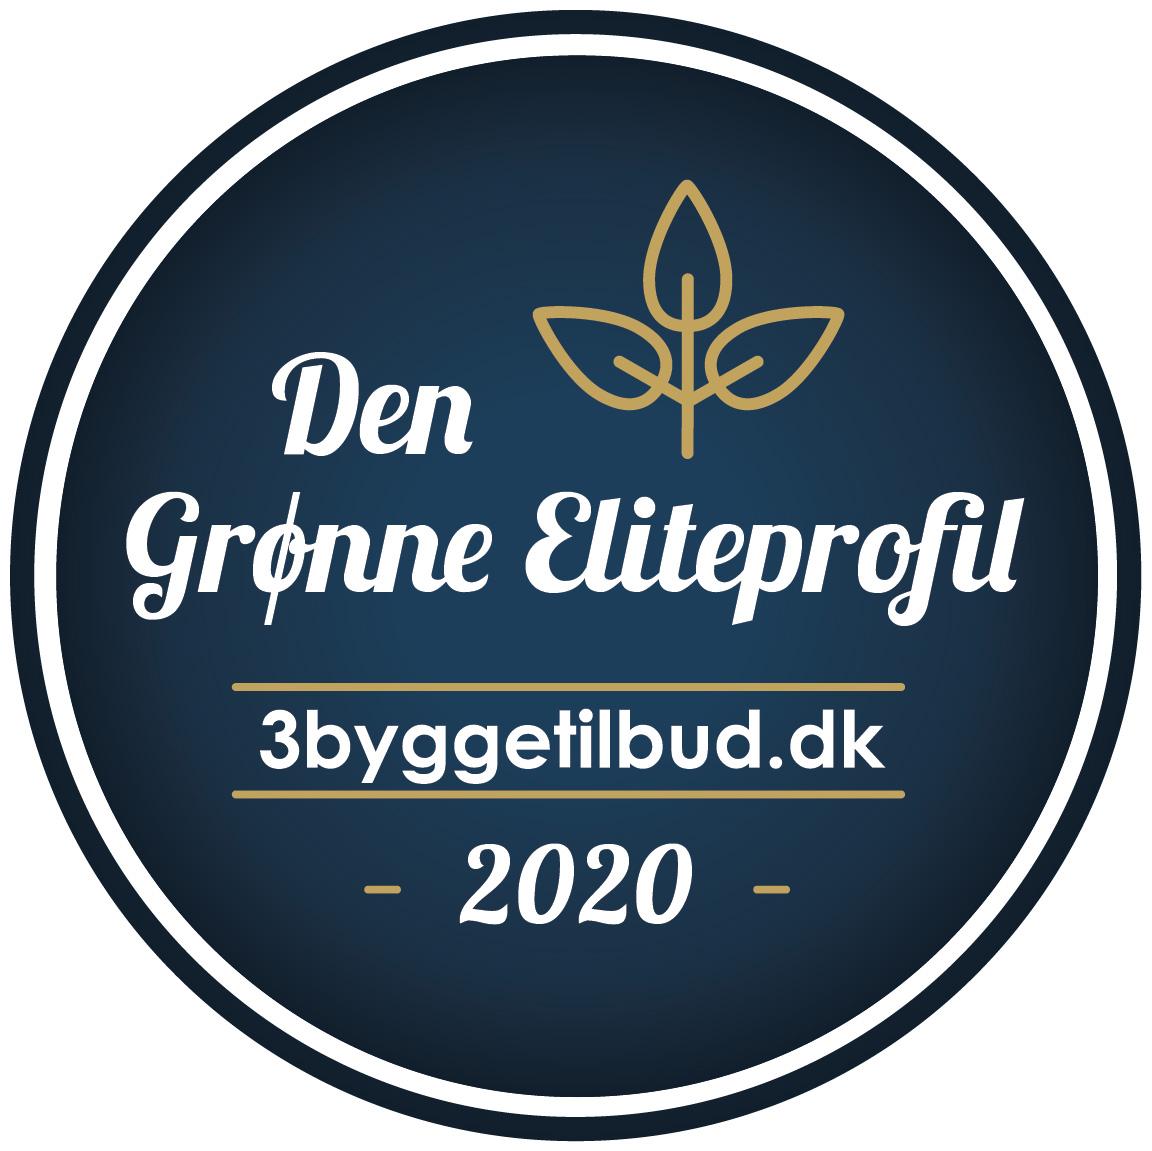 Den grønne eliteprofil 2020